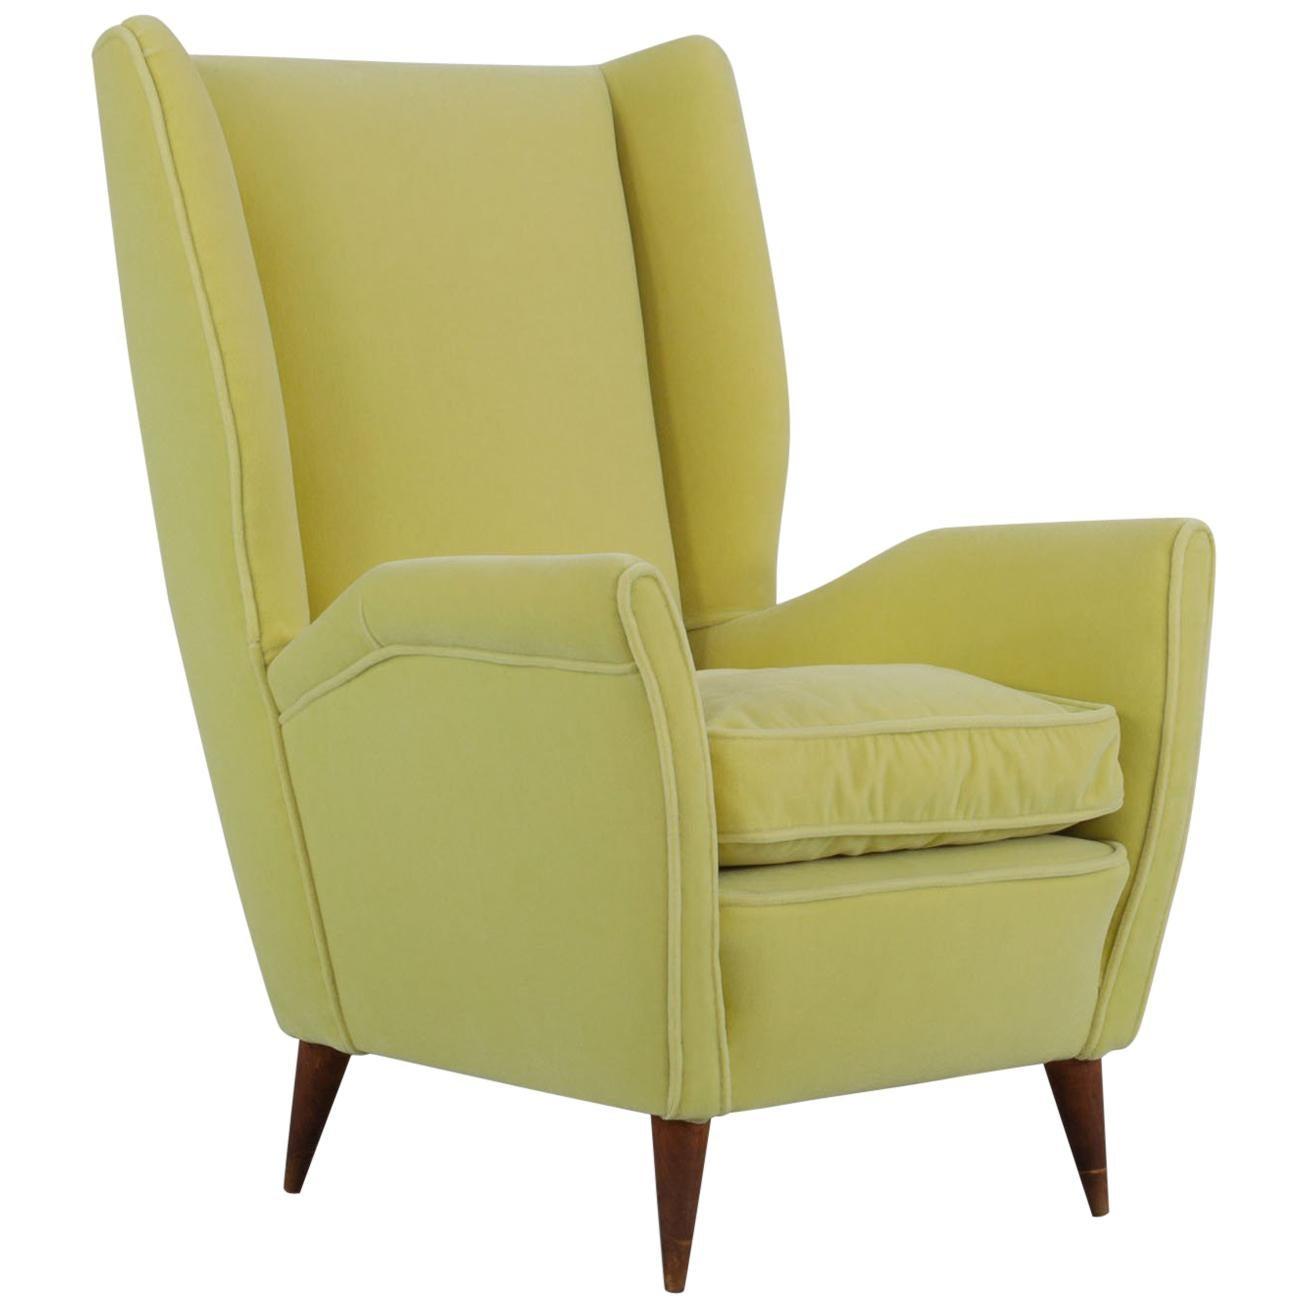 Italian Yellow Wingback Chair, Produced by I.S.A. Bergamo, 1950s